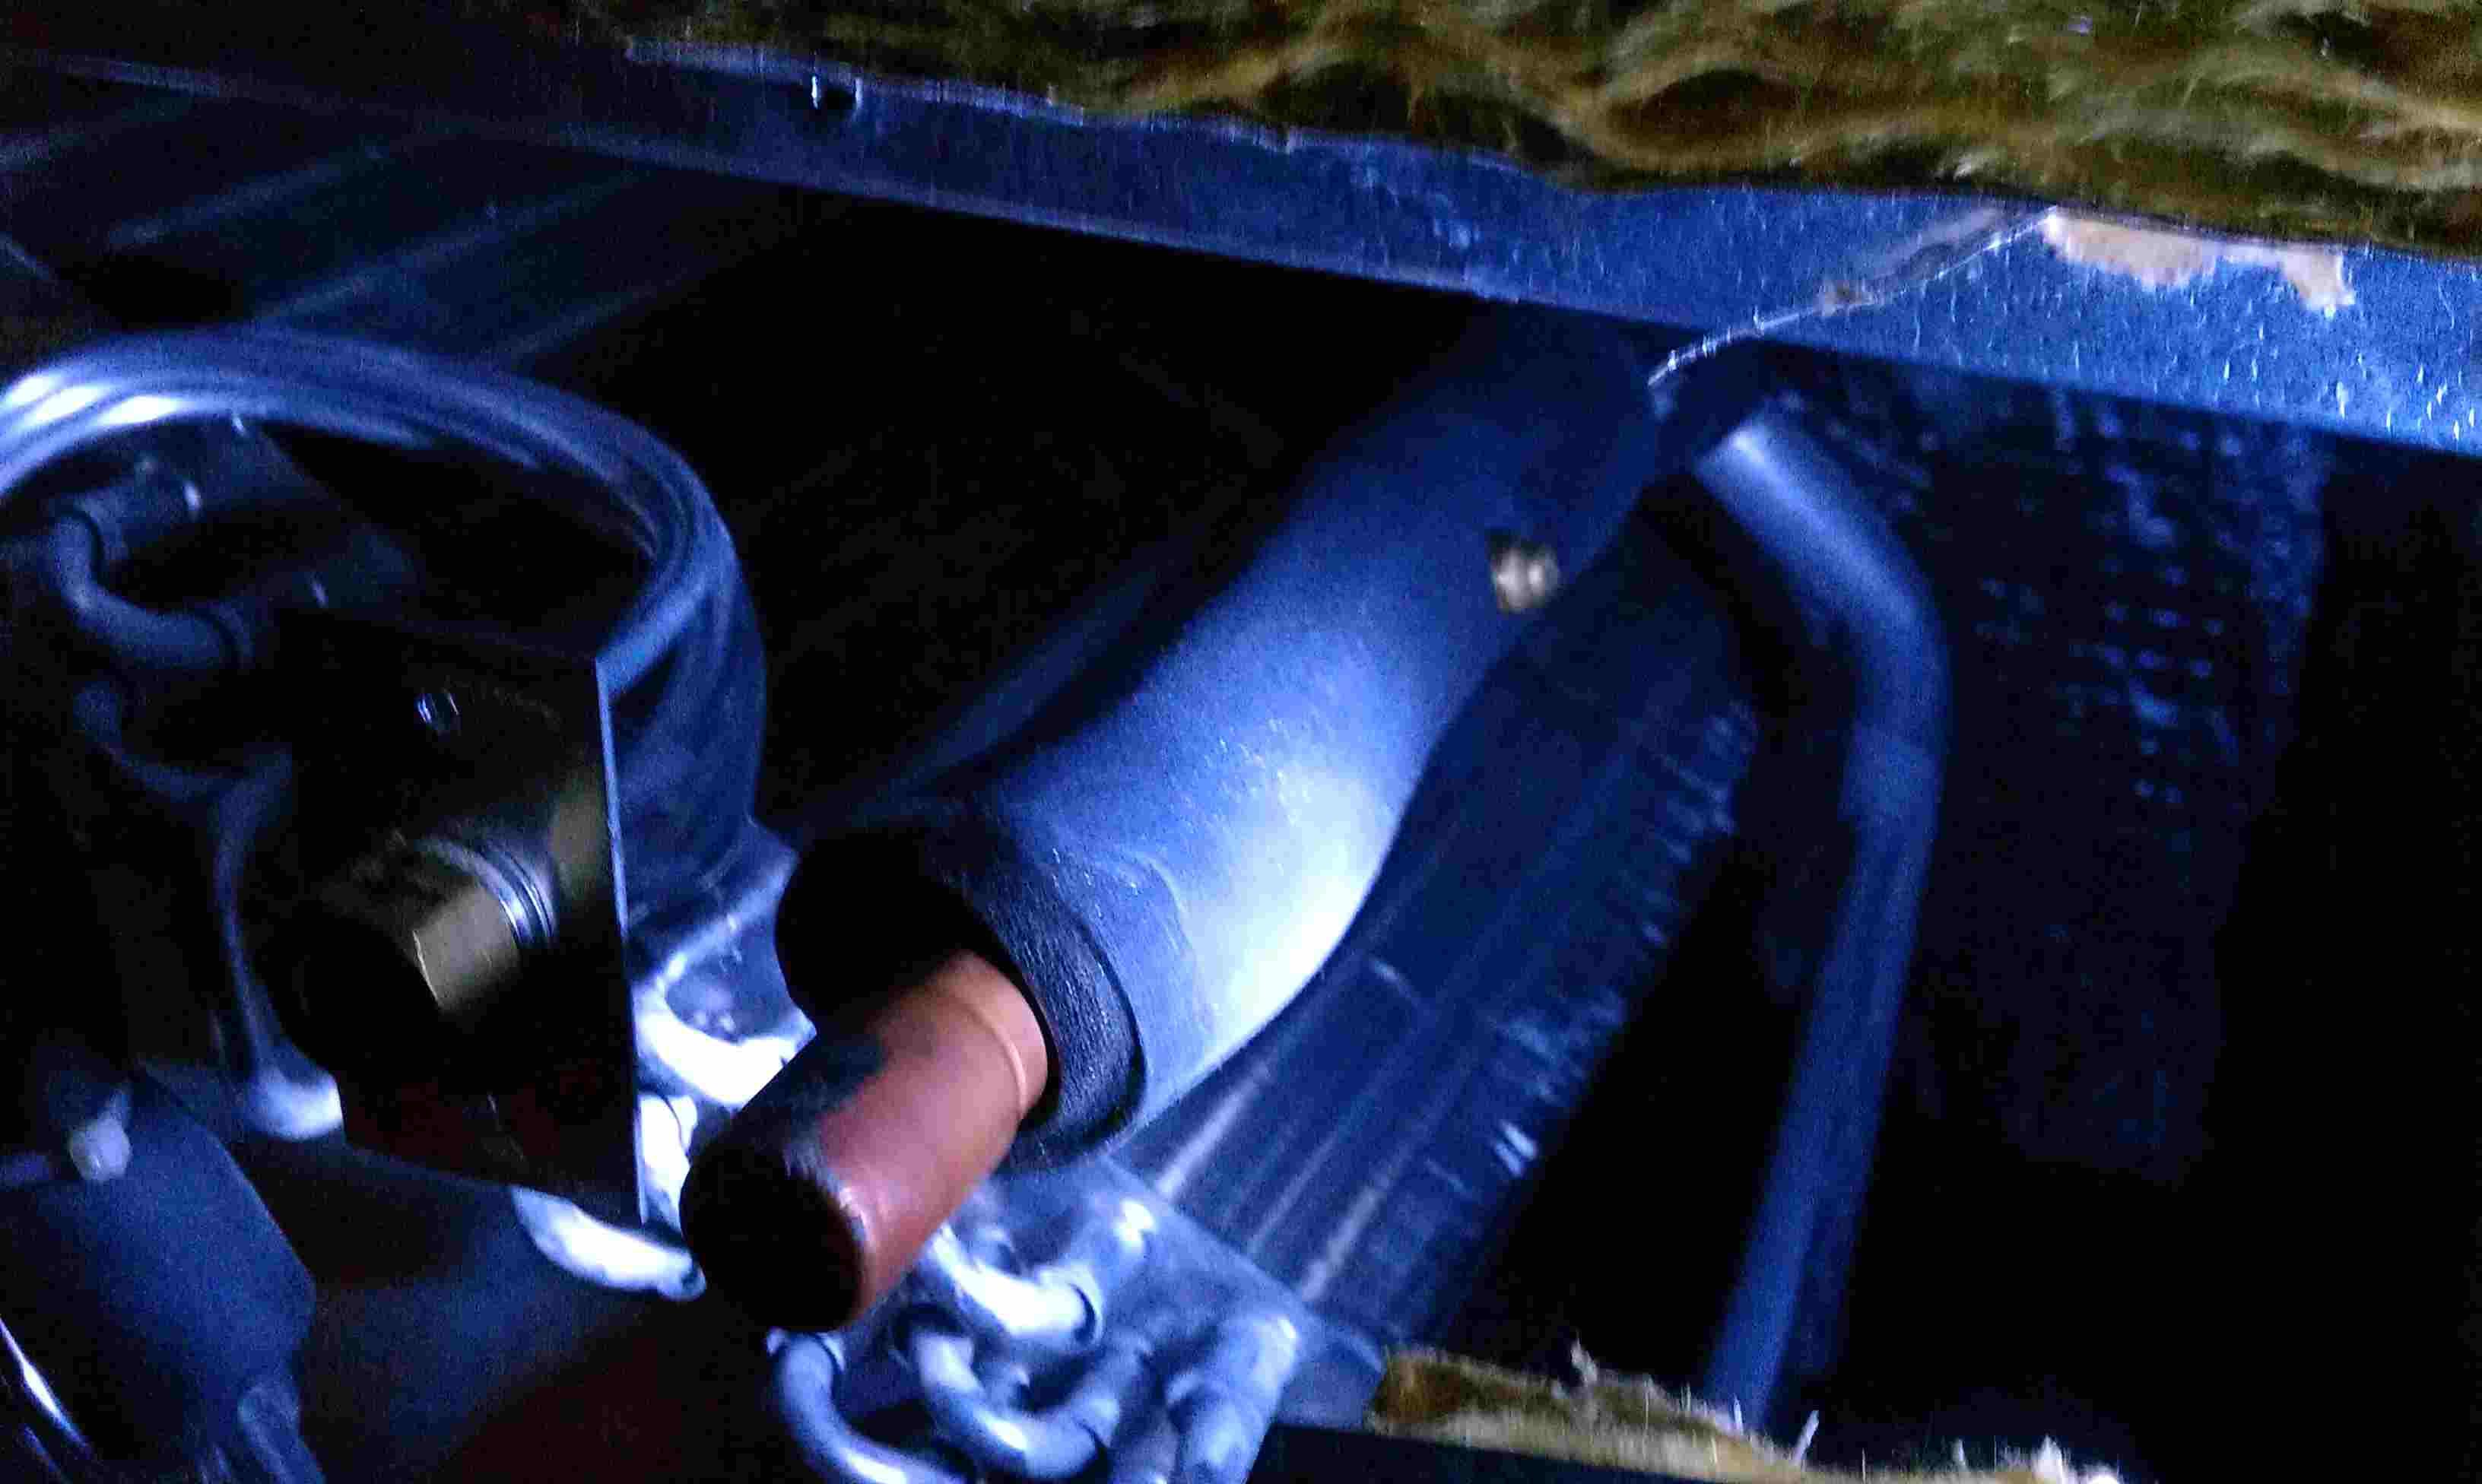 2.5 ton goodman coil flowrater-imag0262-small.jpg